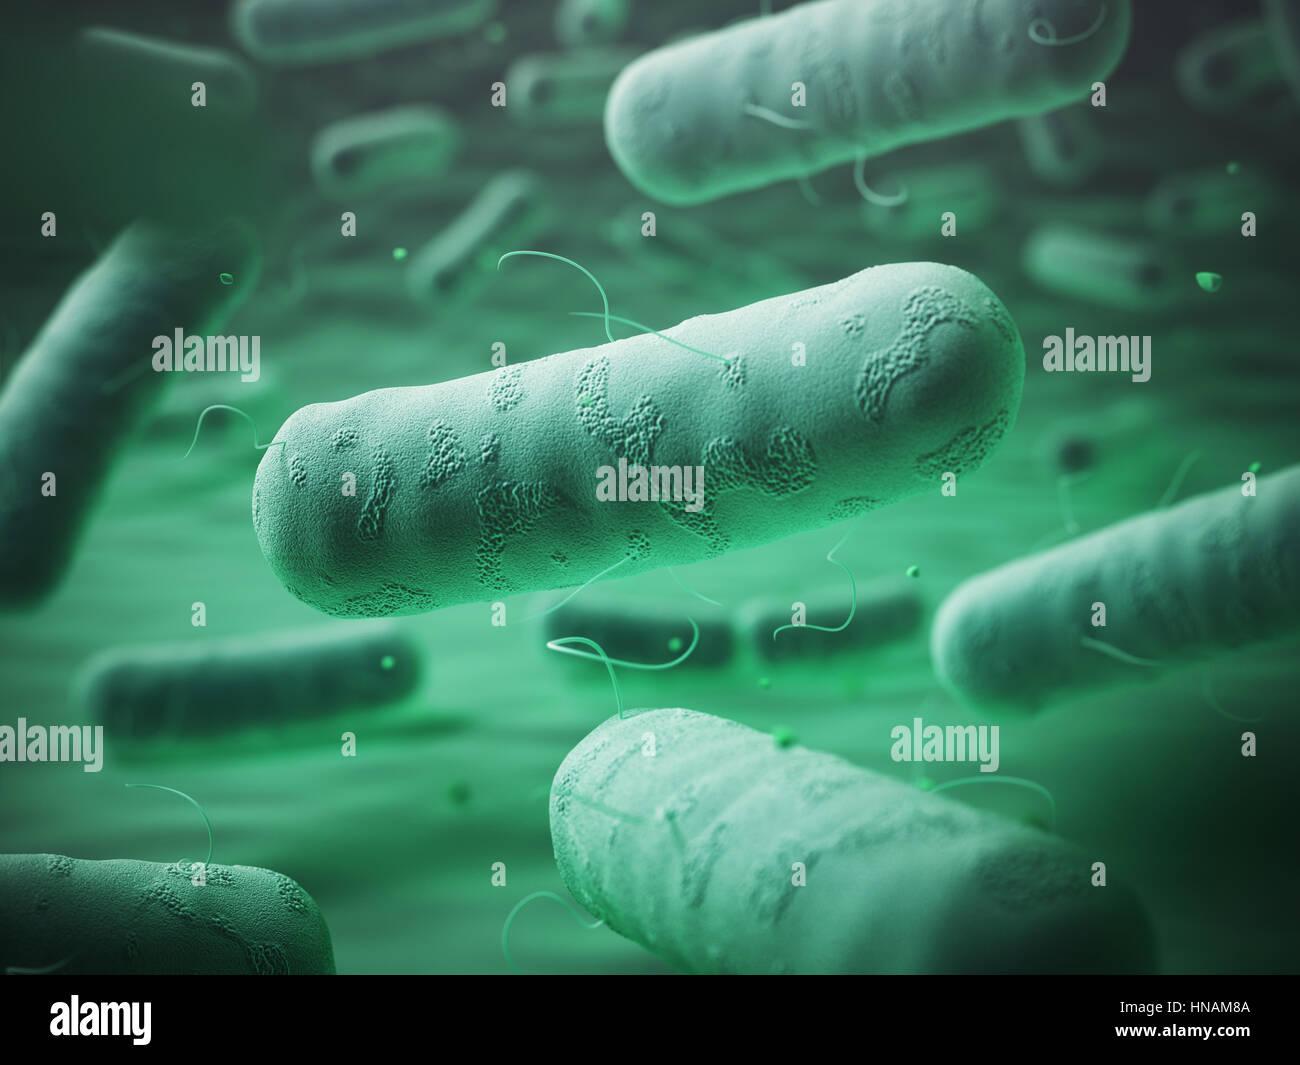 Enterobacteriaceas. Gram-negative bacterias escherichia coli, salmonella, klebsiella, legionella, mycobacterium - Stock Image